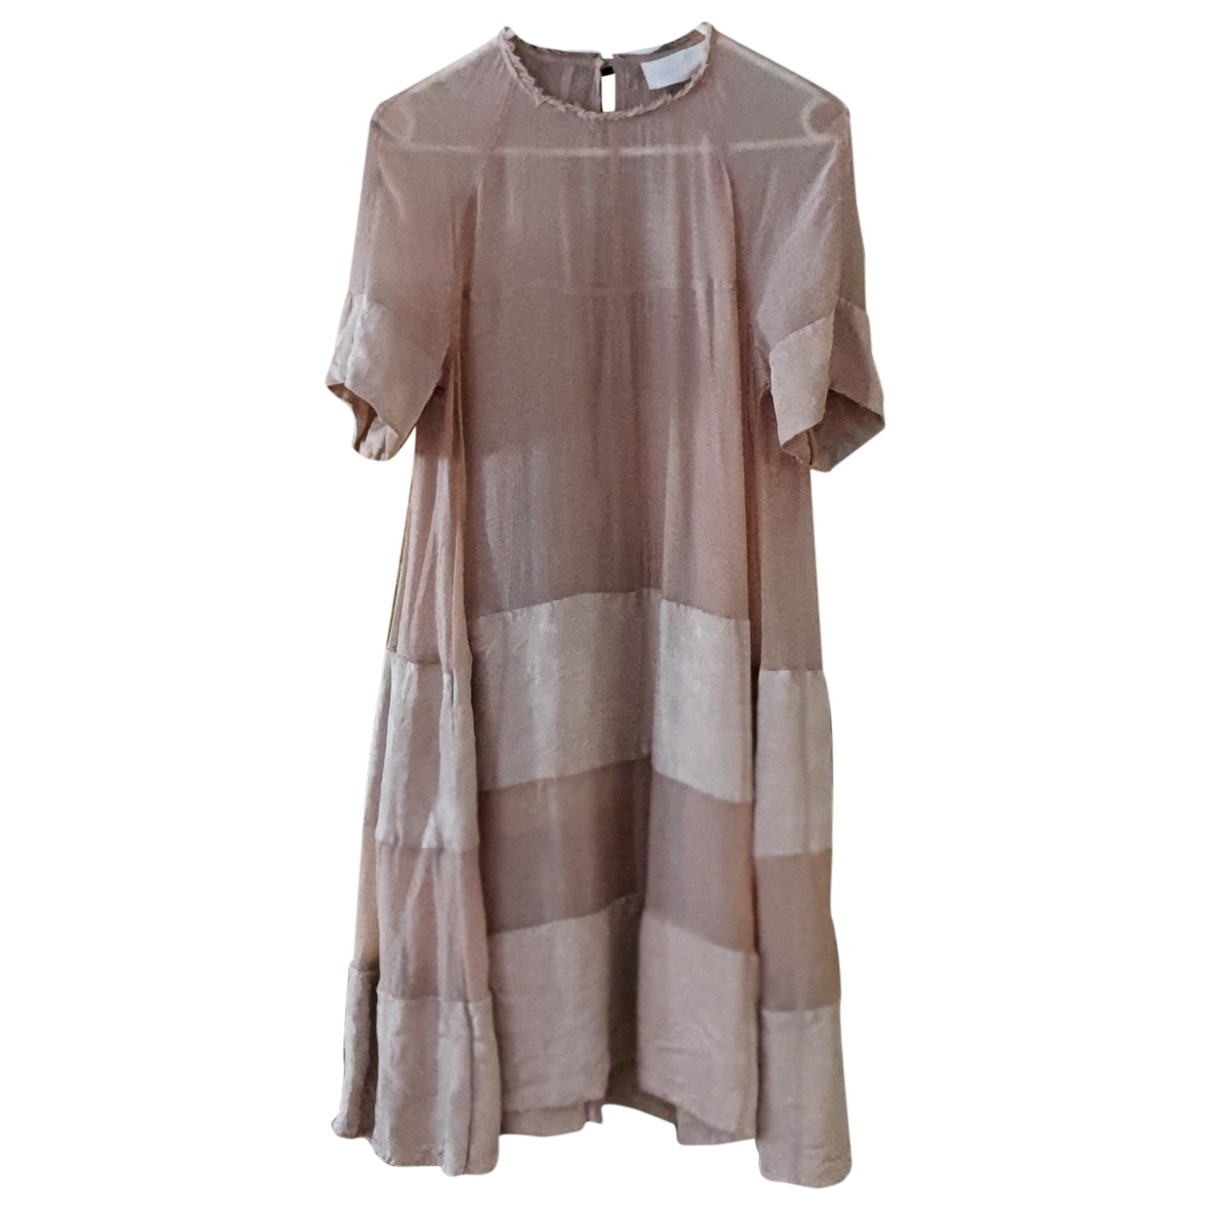 H&m Conscious Exclusive \N Kleid in  Beige Polyester